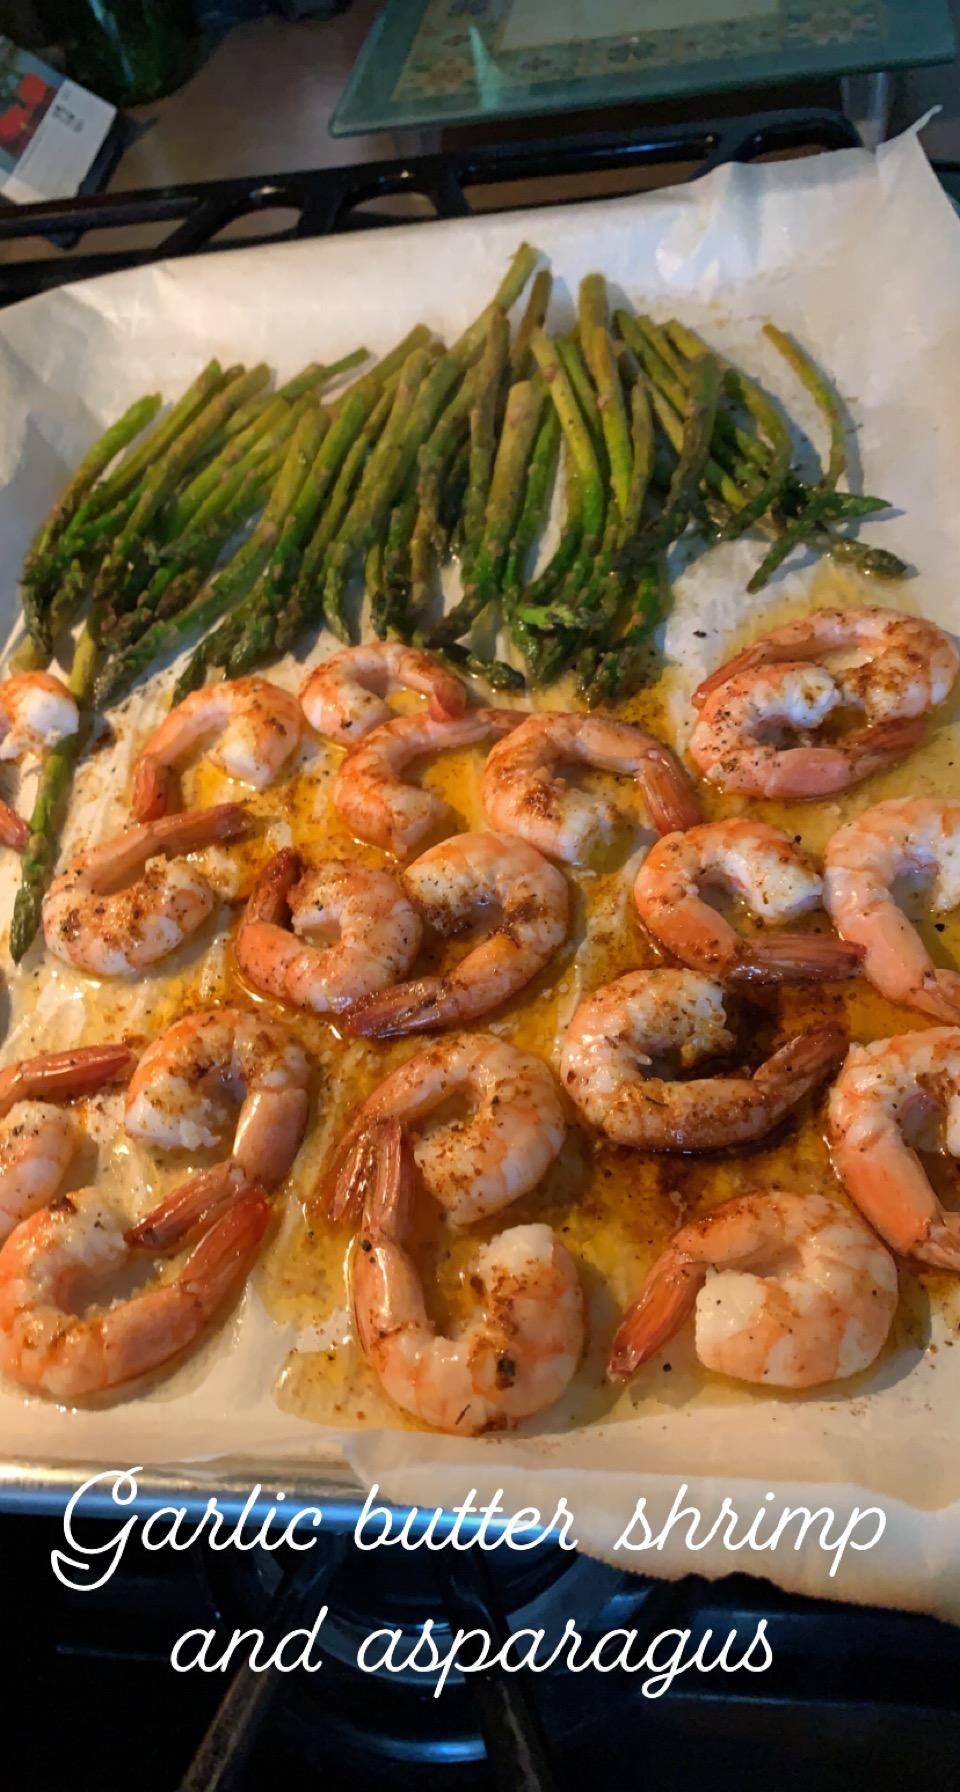 Sheet Pan Lemon Butter Garlic Shrimp with Asparagus